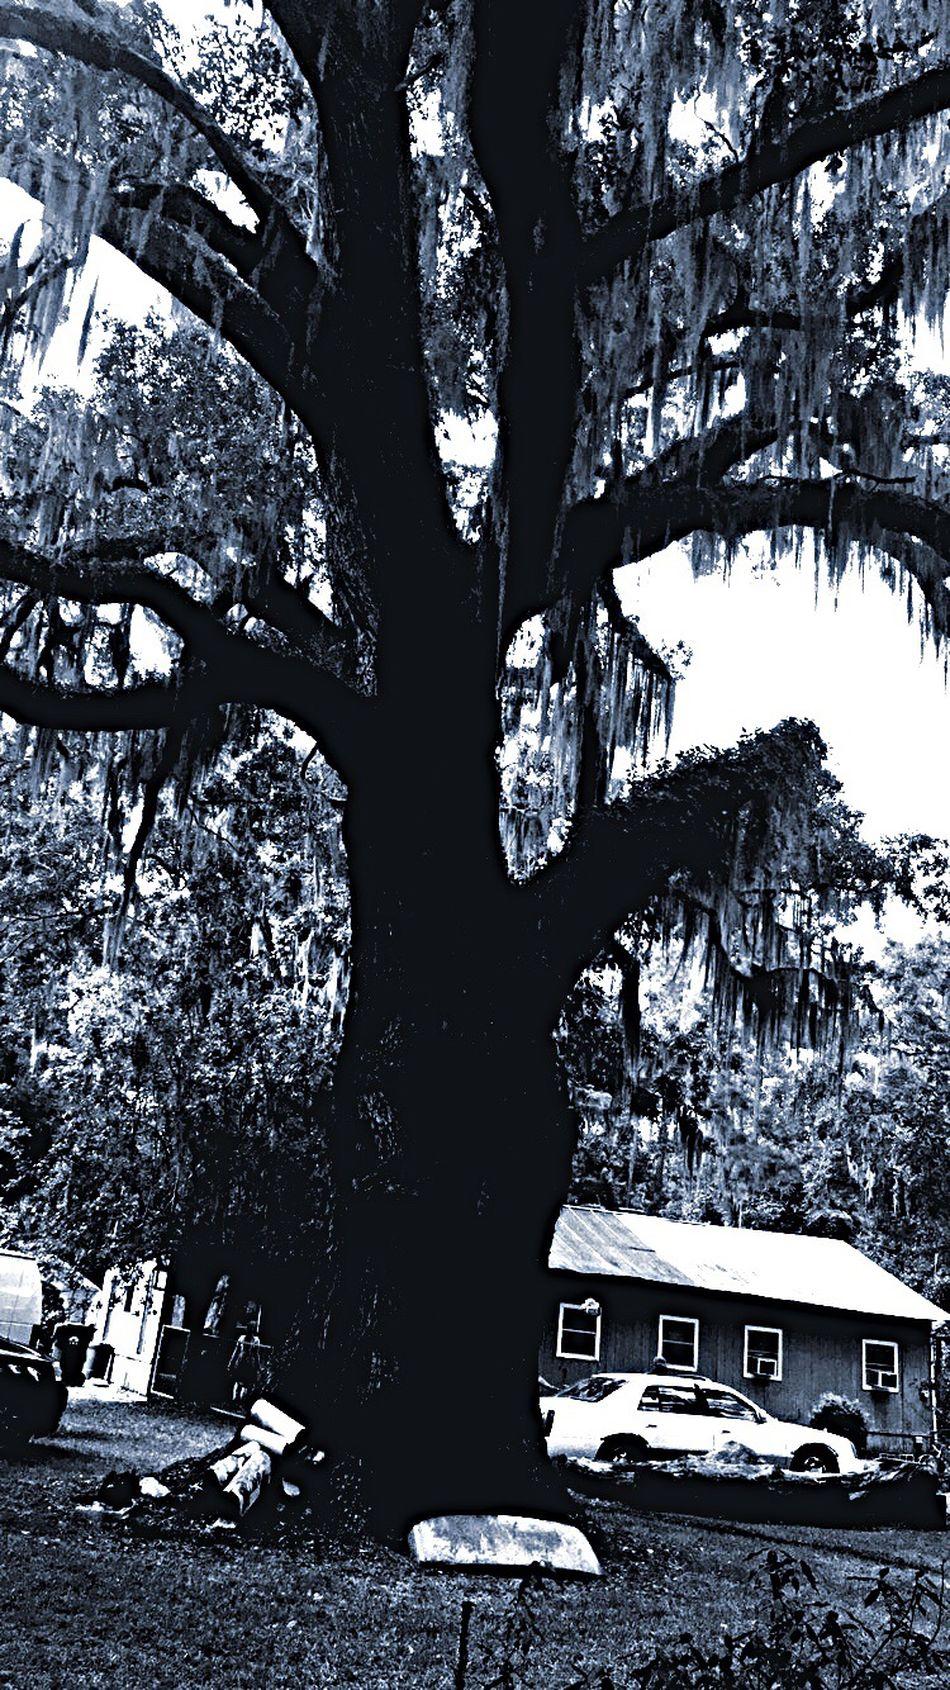 WhatABeauty Treephotography NaturalBeauty Naturephotosnow Nature Natural Ilovetrees Bigandbeautiful Country Onafarm Georgia Checkitout Eyeemphotography Eyeemtrees Treelovers Connected